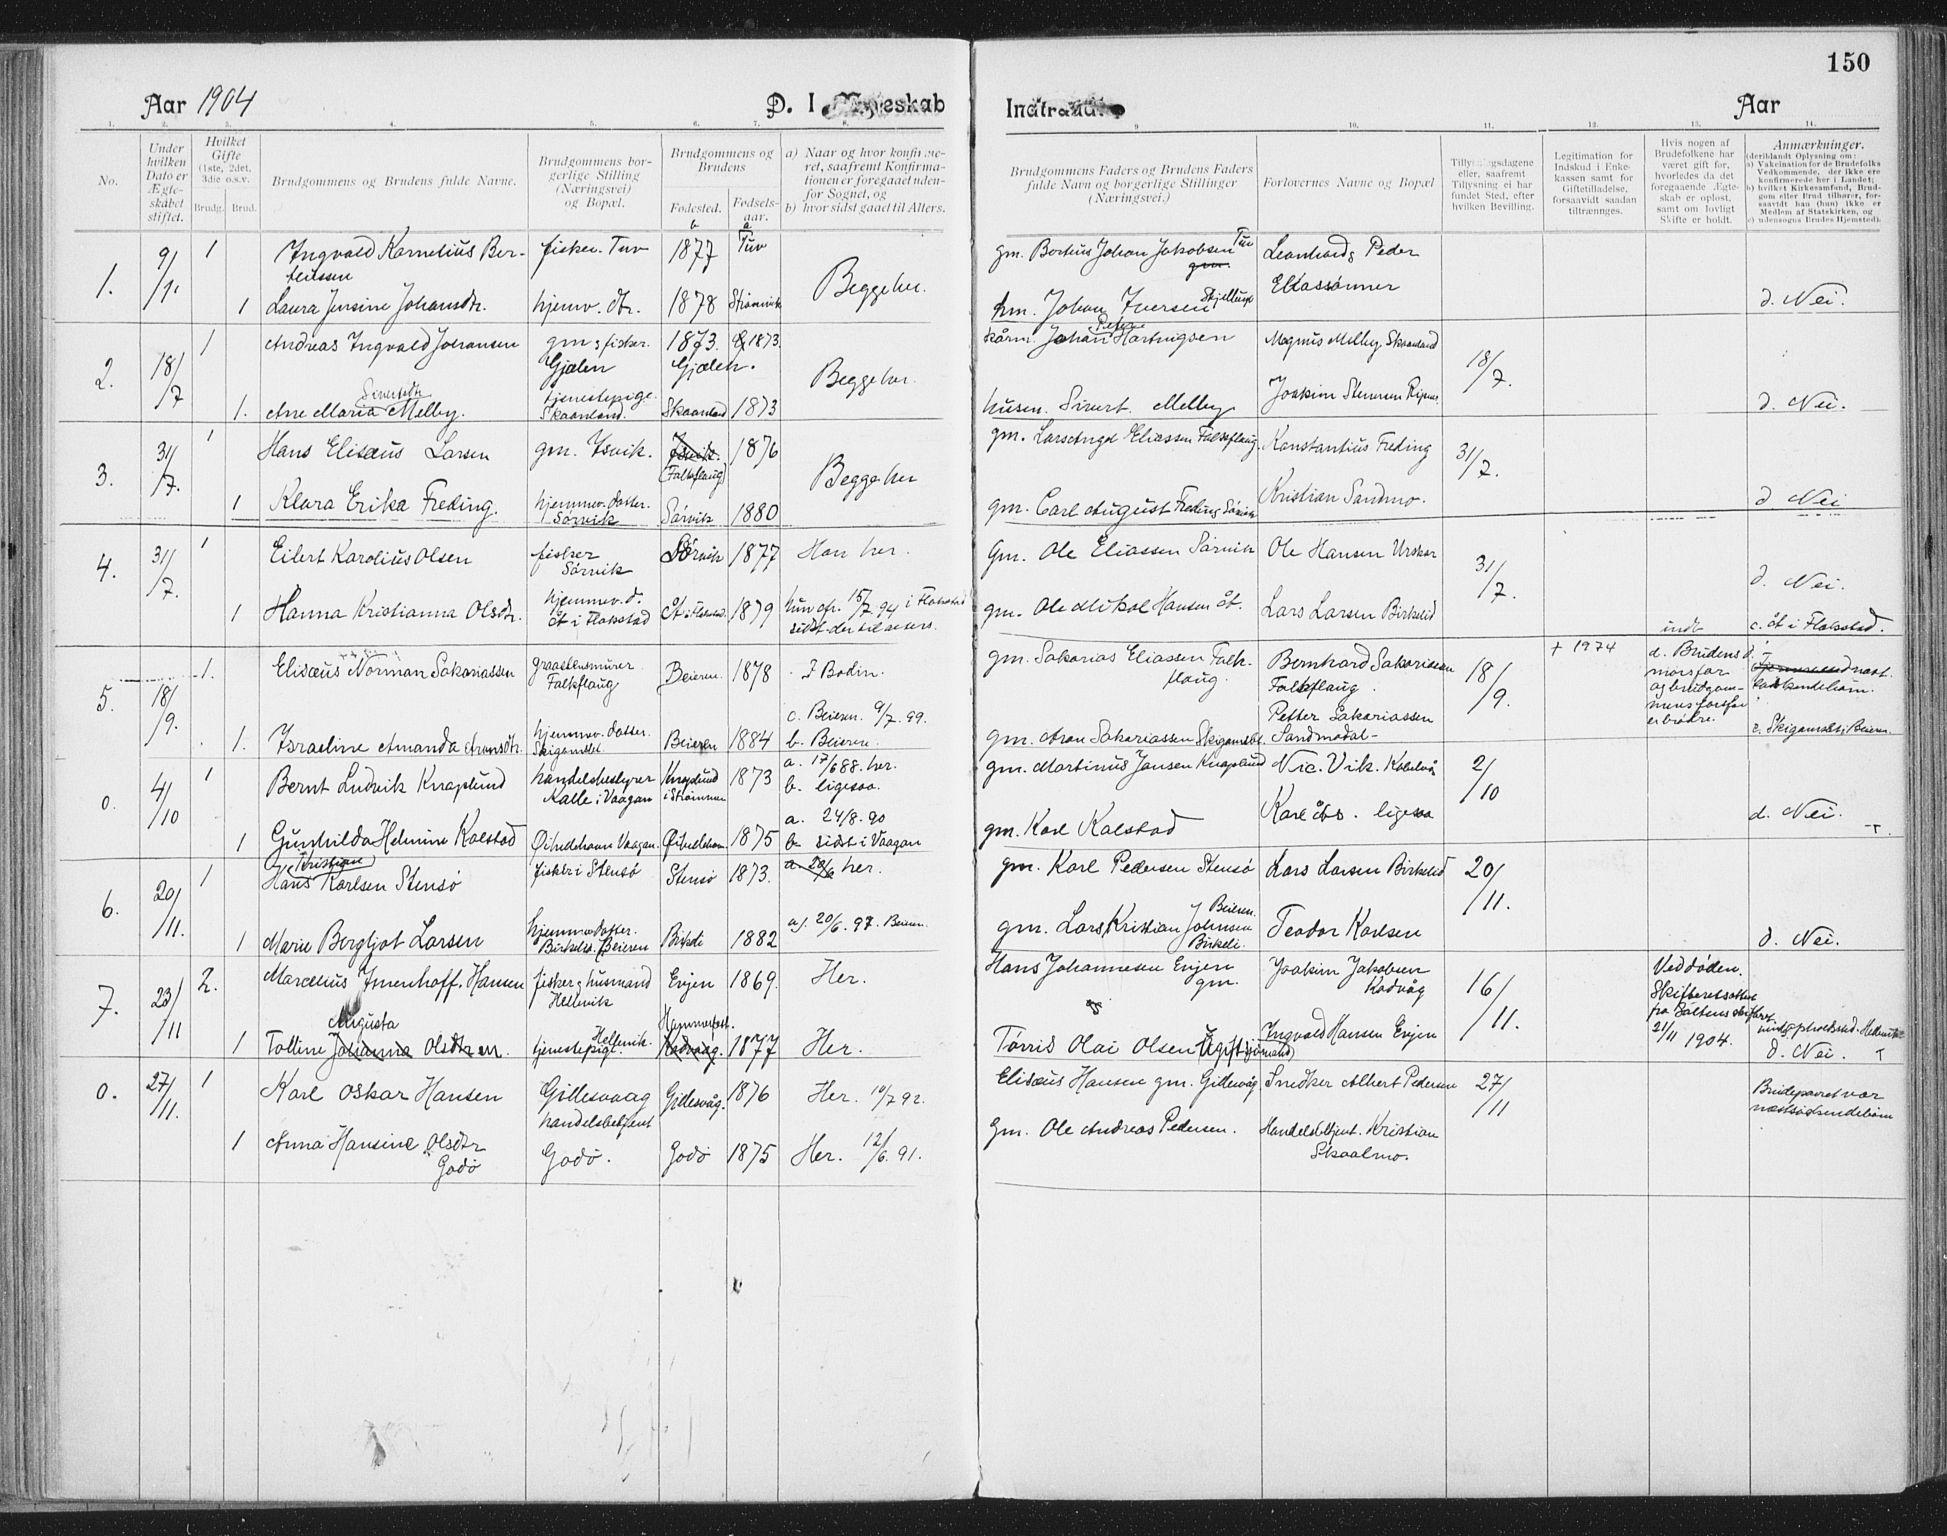 SAT, Ministerialprotokoller, klokkerbøker og fødselsregistre - Nordland, 804/L0081: Ministerialbok nr. 804A02, 1901-1915, s. 150